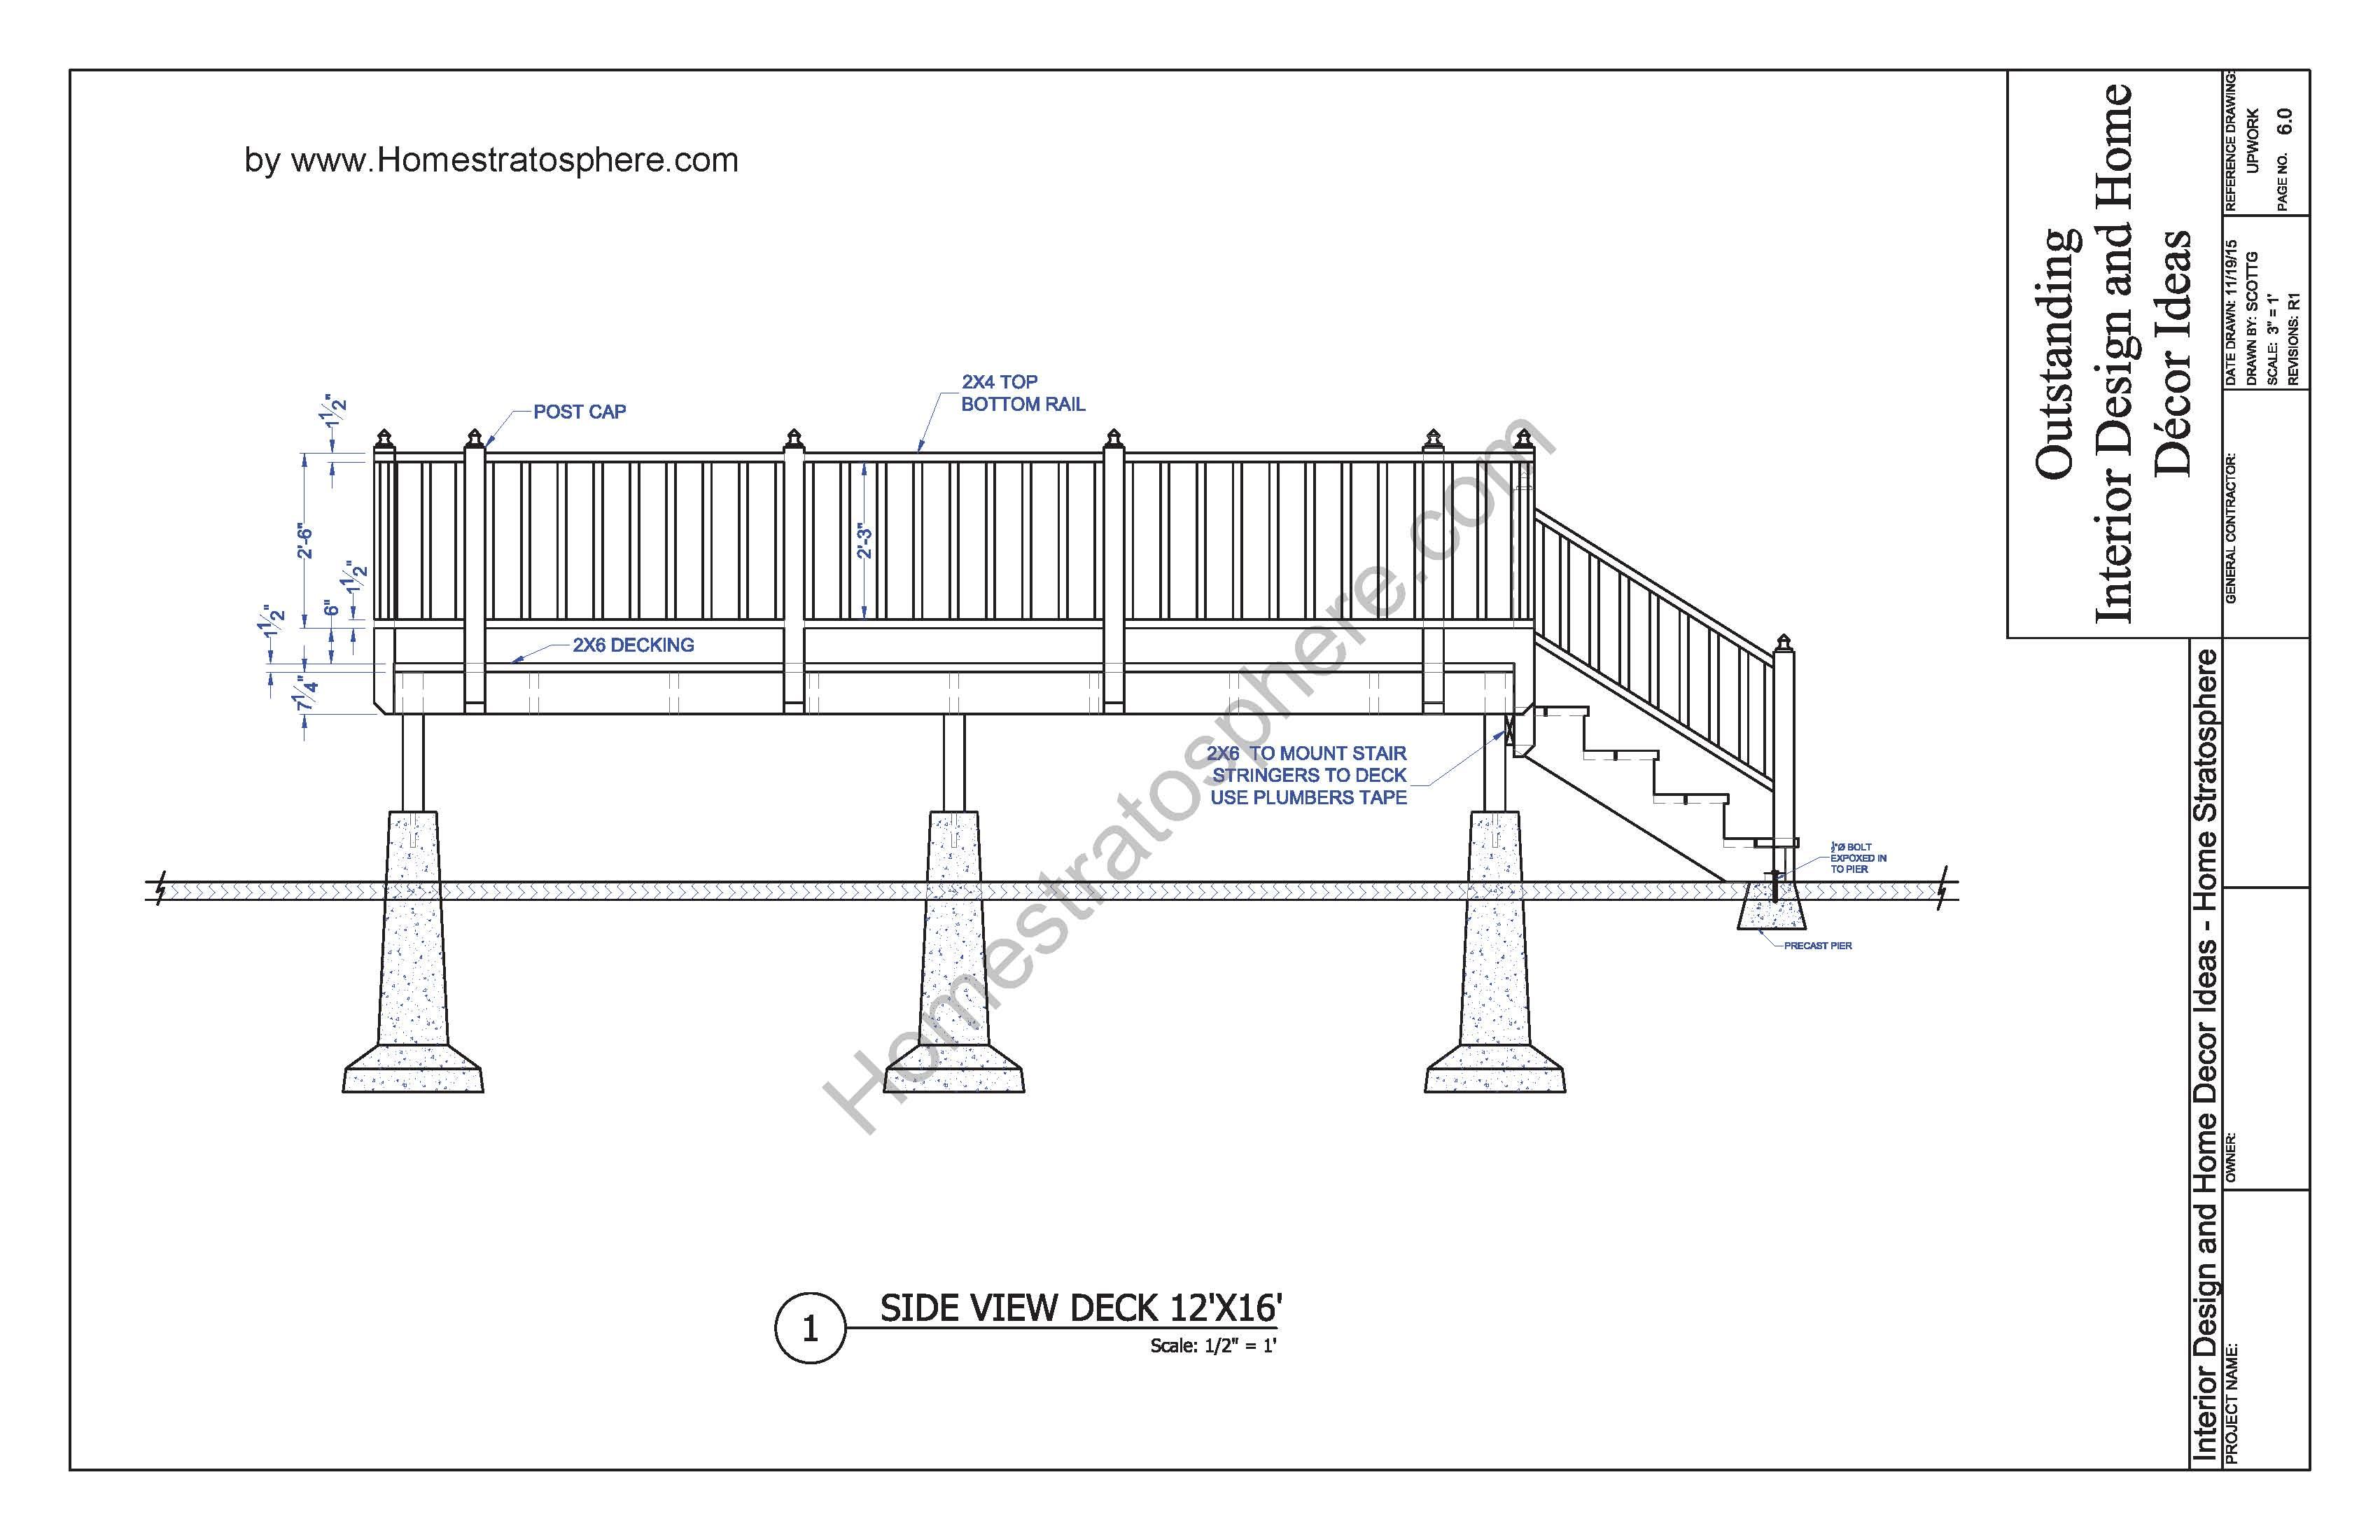 Free 12 X 16 Deck Plan Blueprint With Document